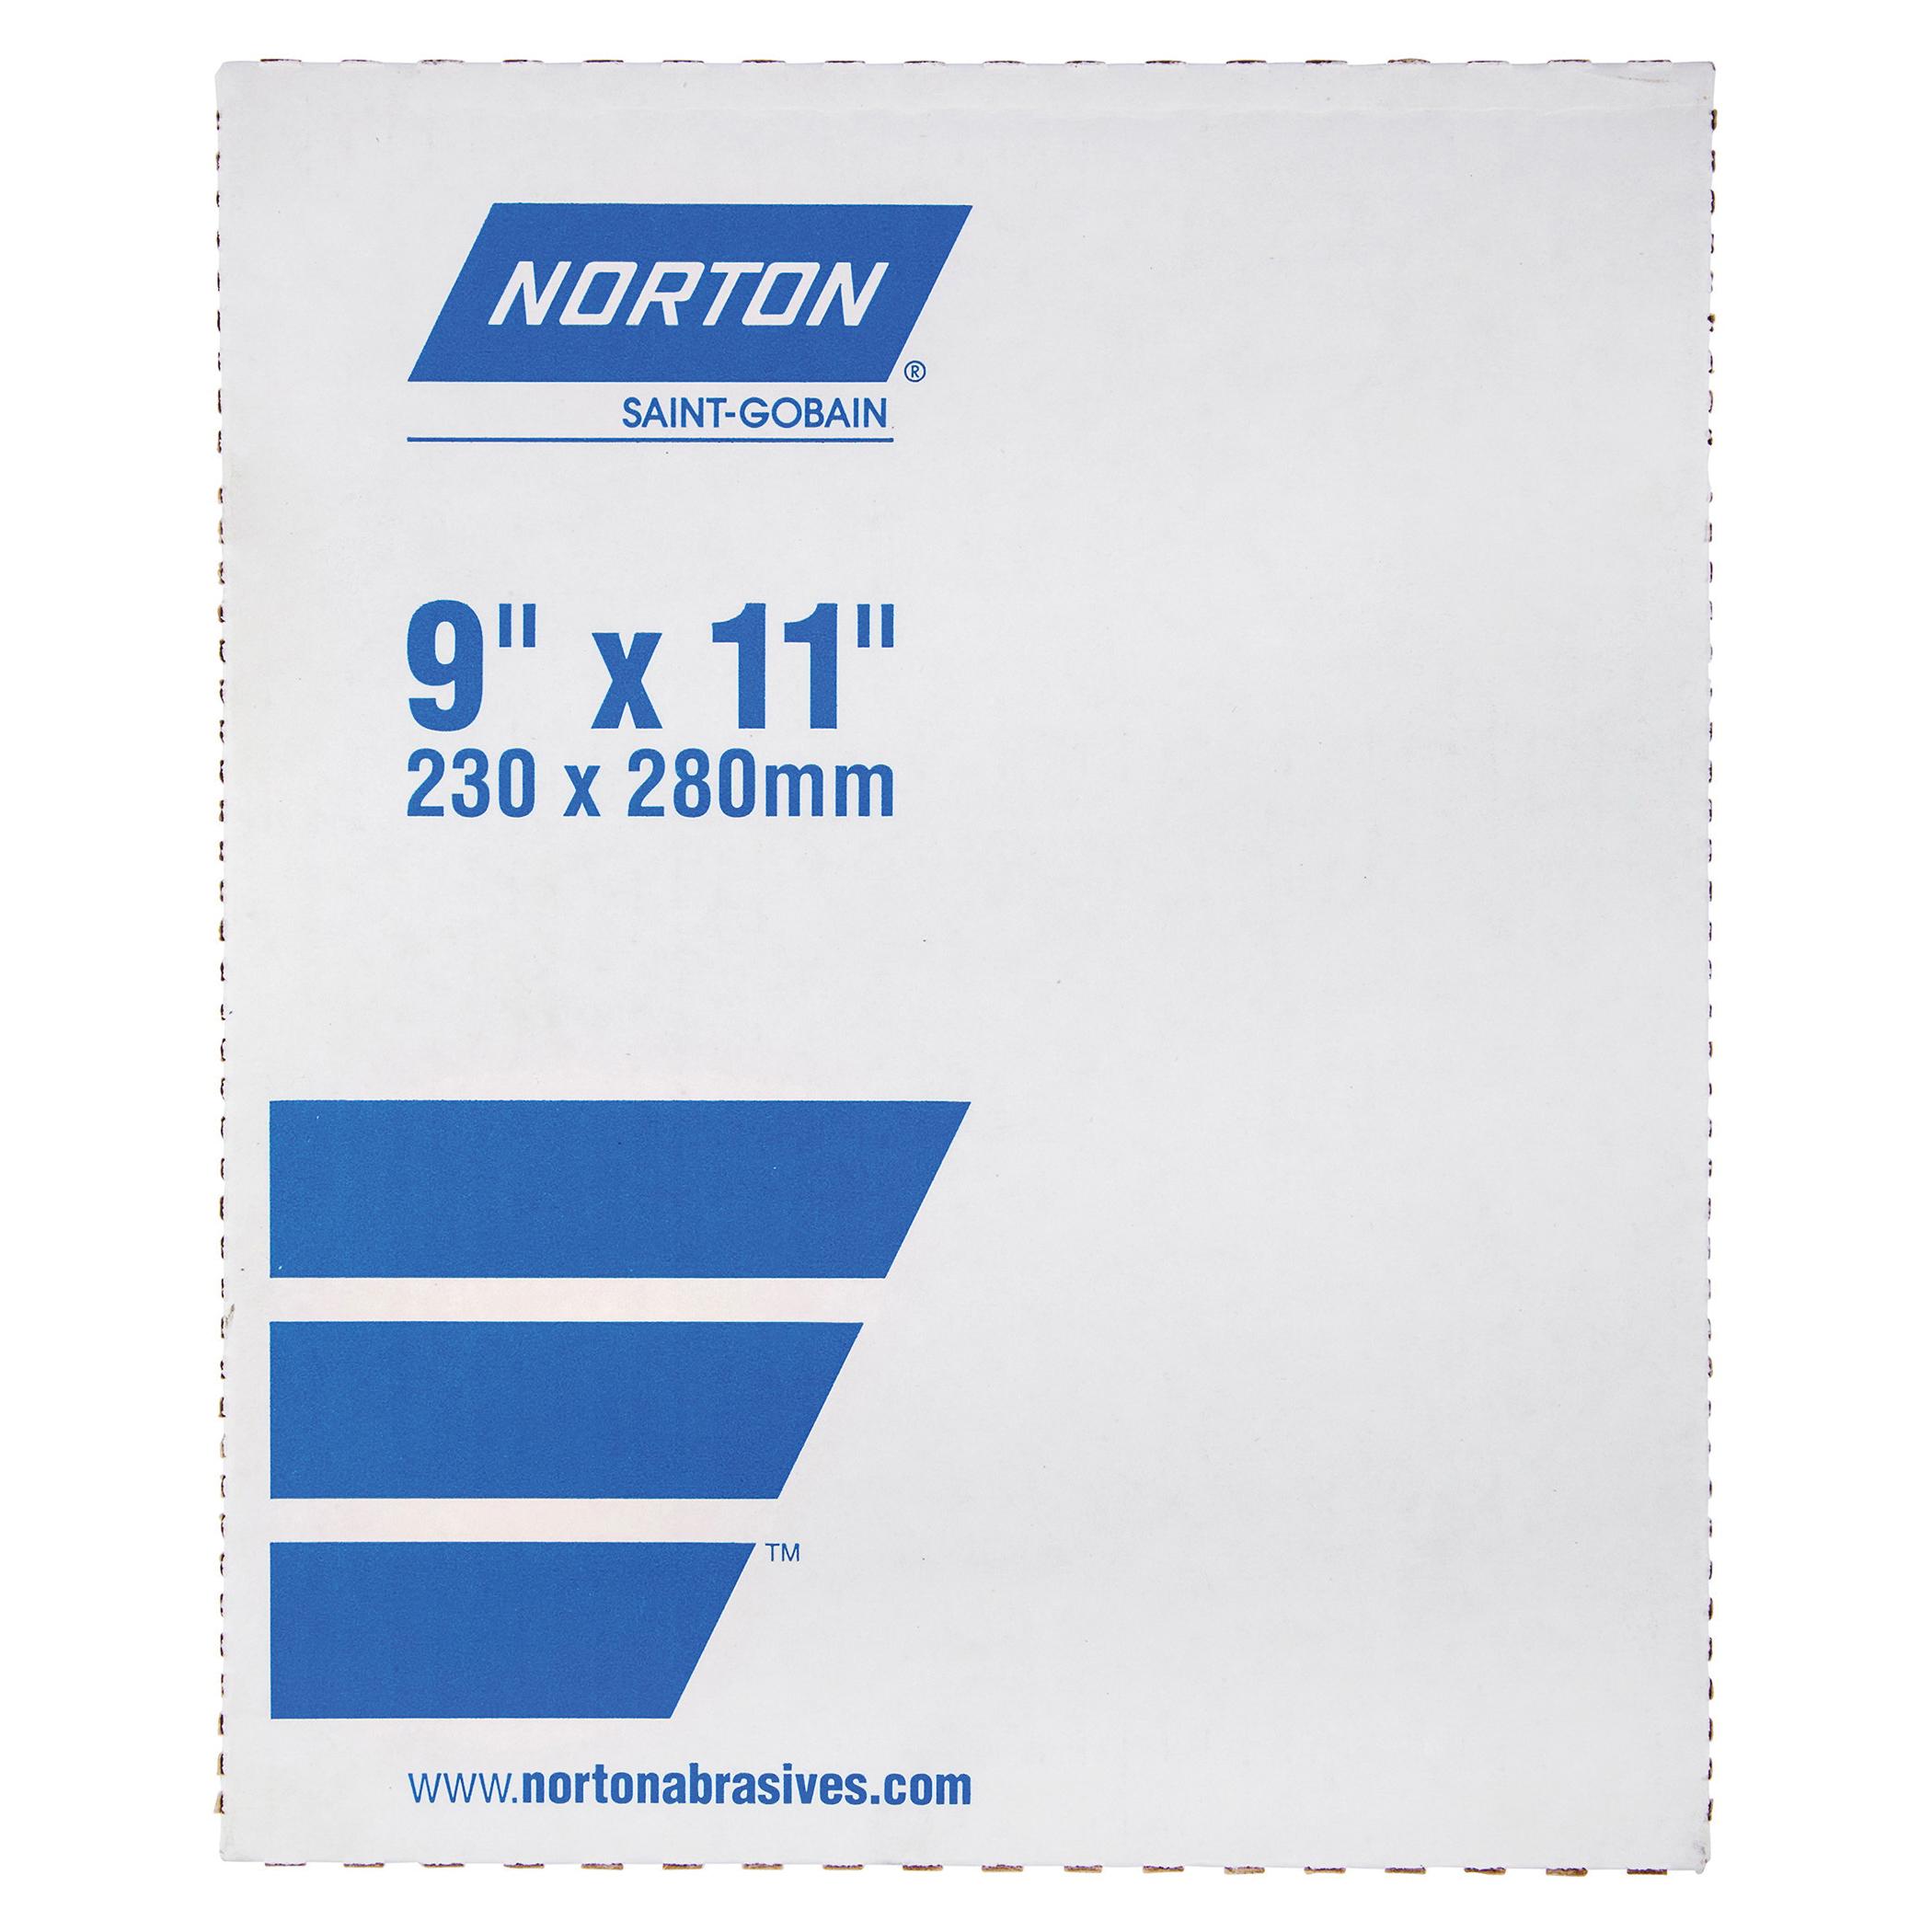 Norton® 66261101525 A513 Coated Sandpaper Sheet, 11 in L x 9 in W, 150 Grit, Fine Grade, Garnet Abrasive, Paper Backing